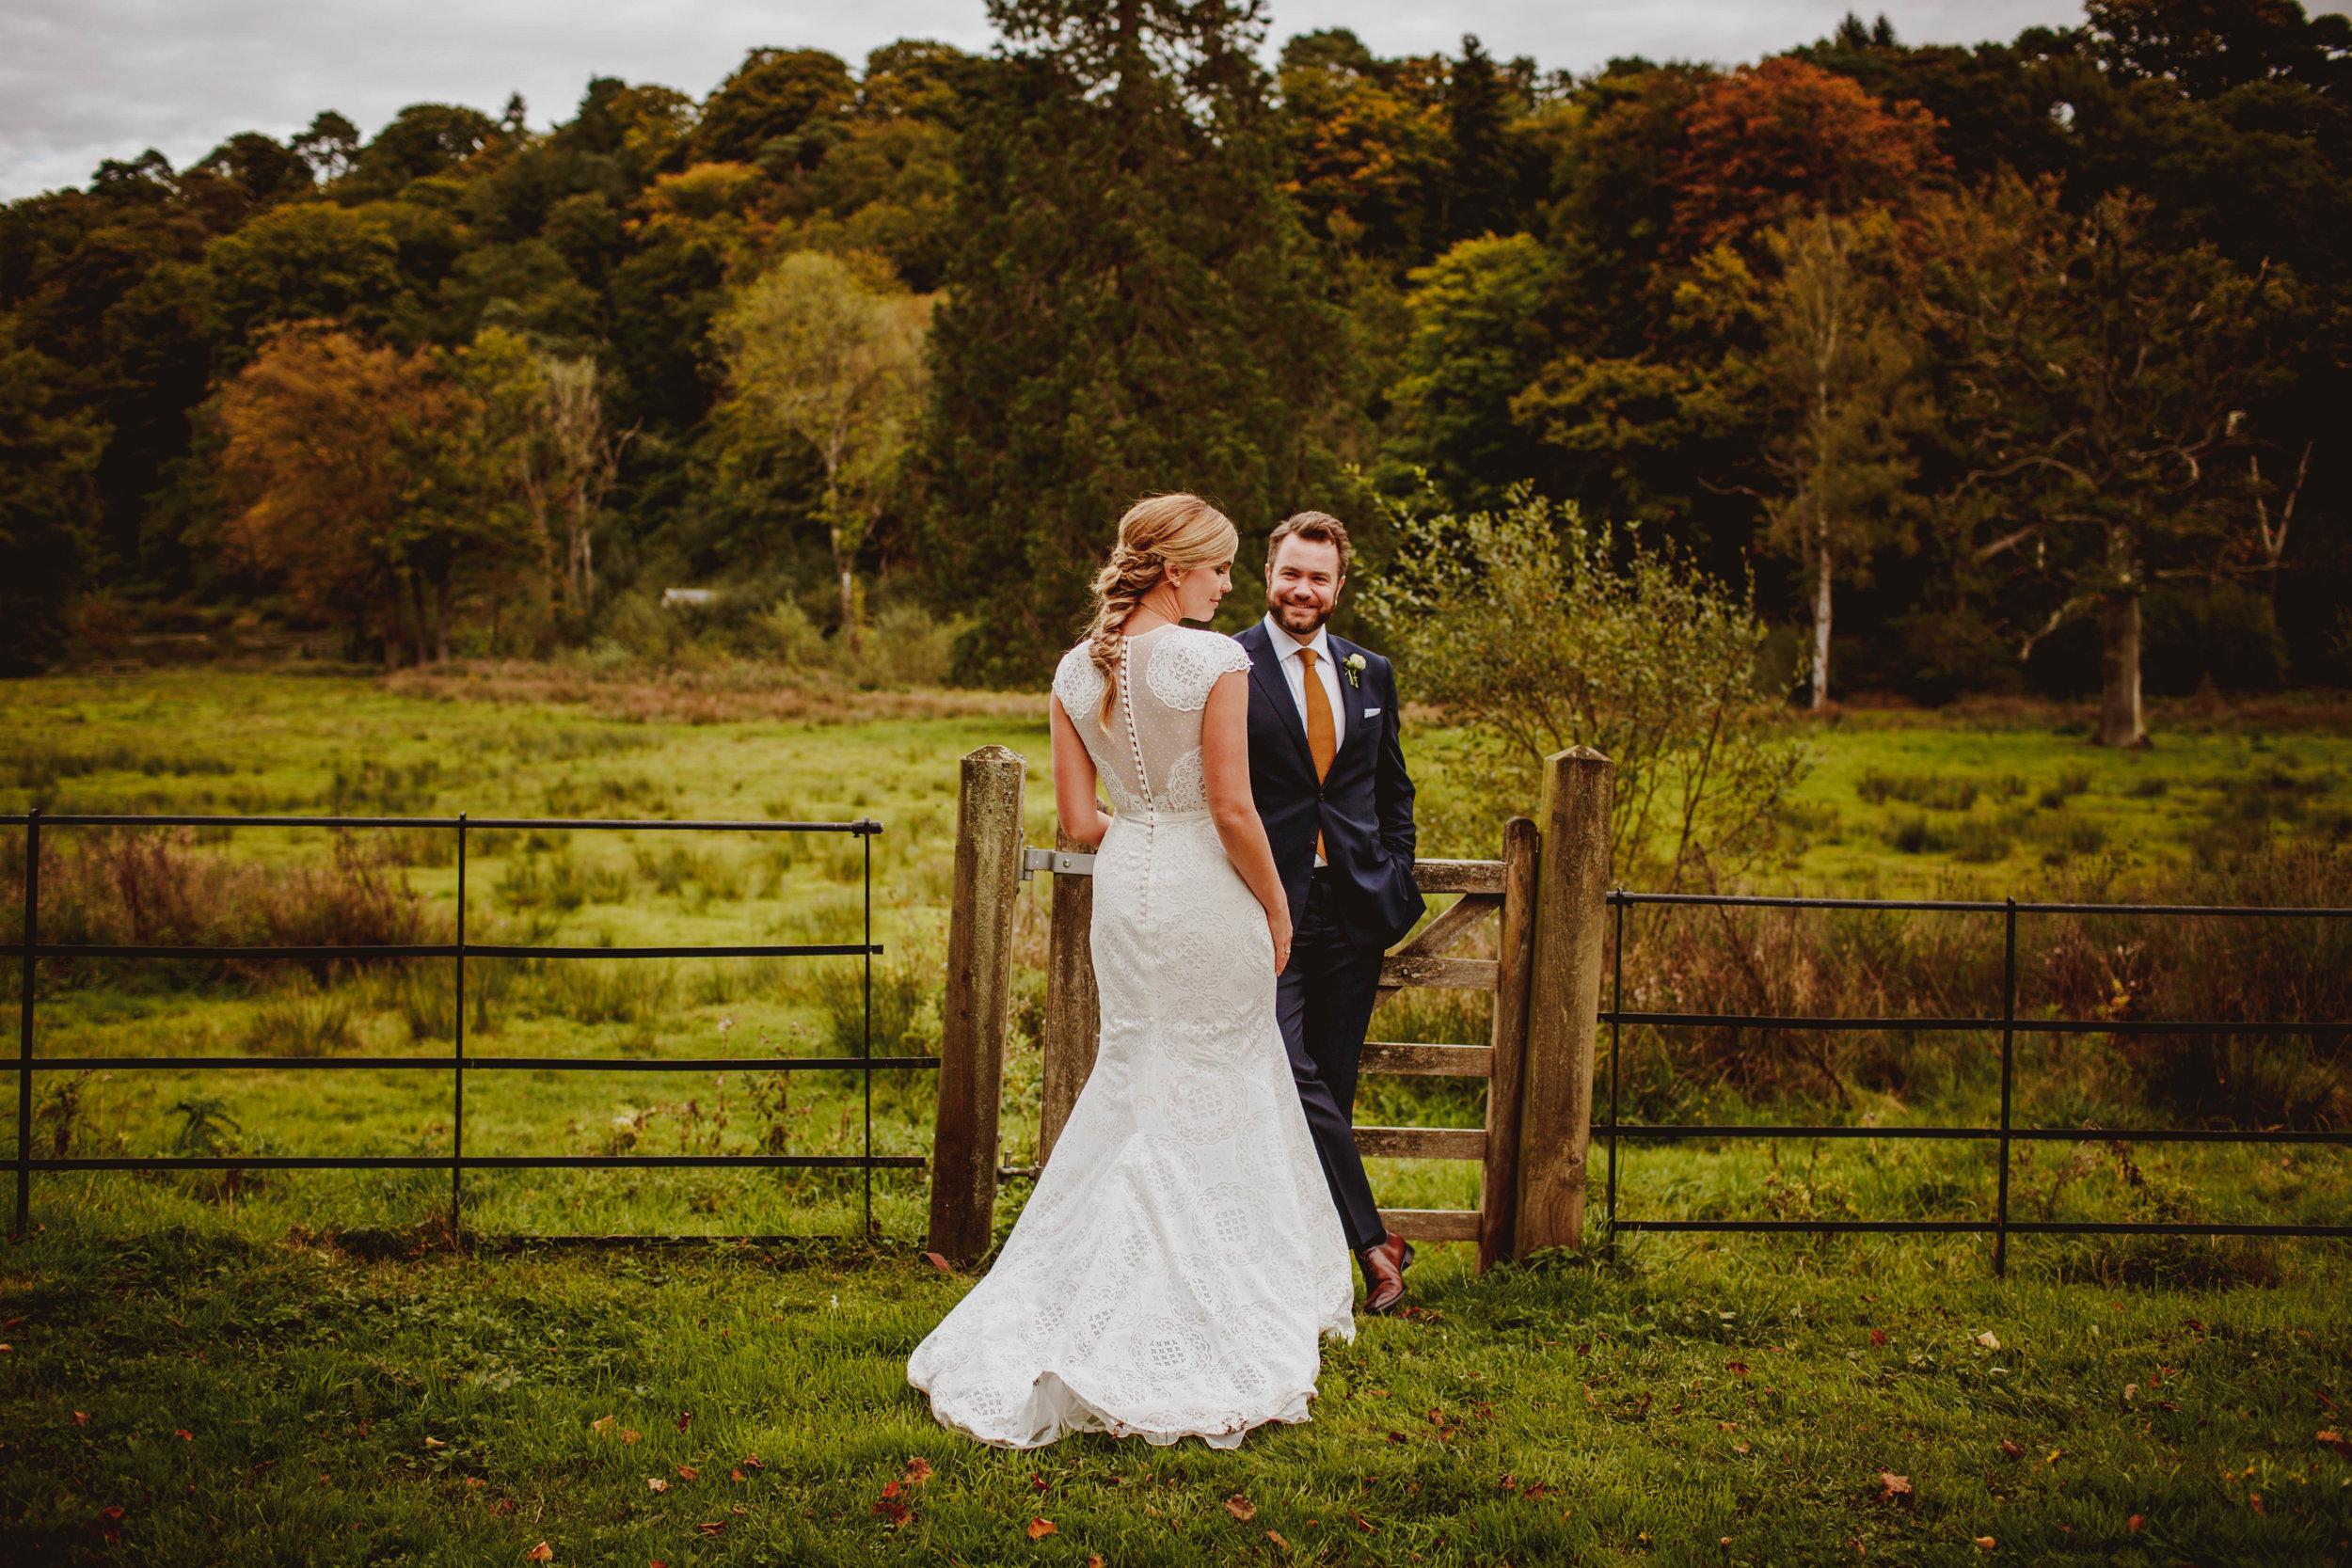 Surrey-wedding-photography-35.jpg